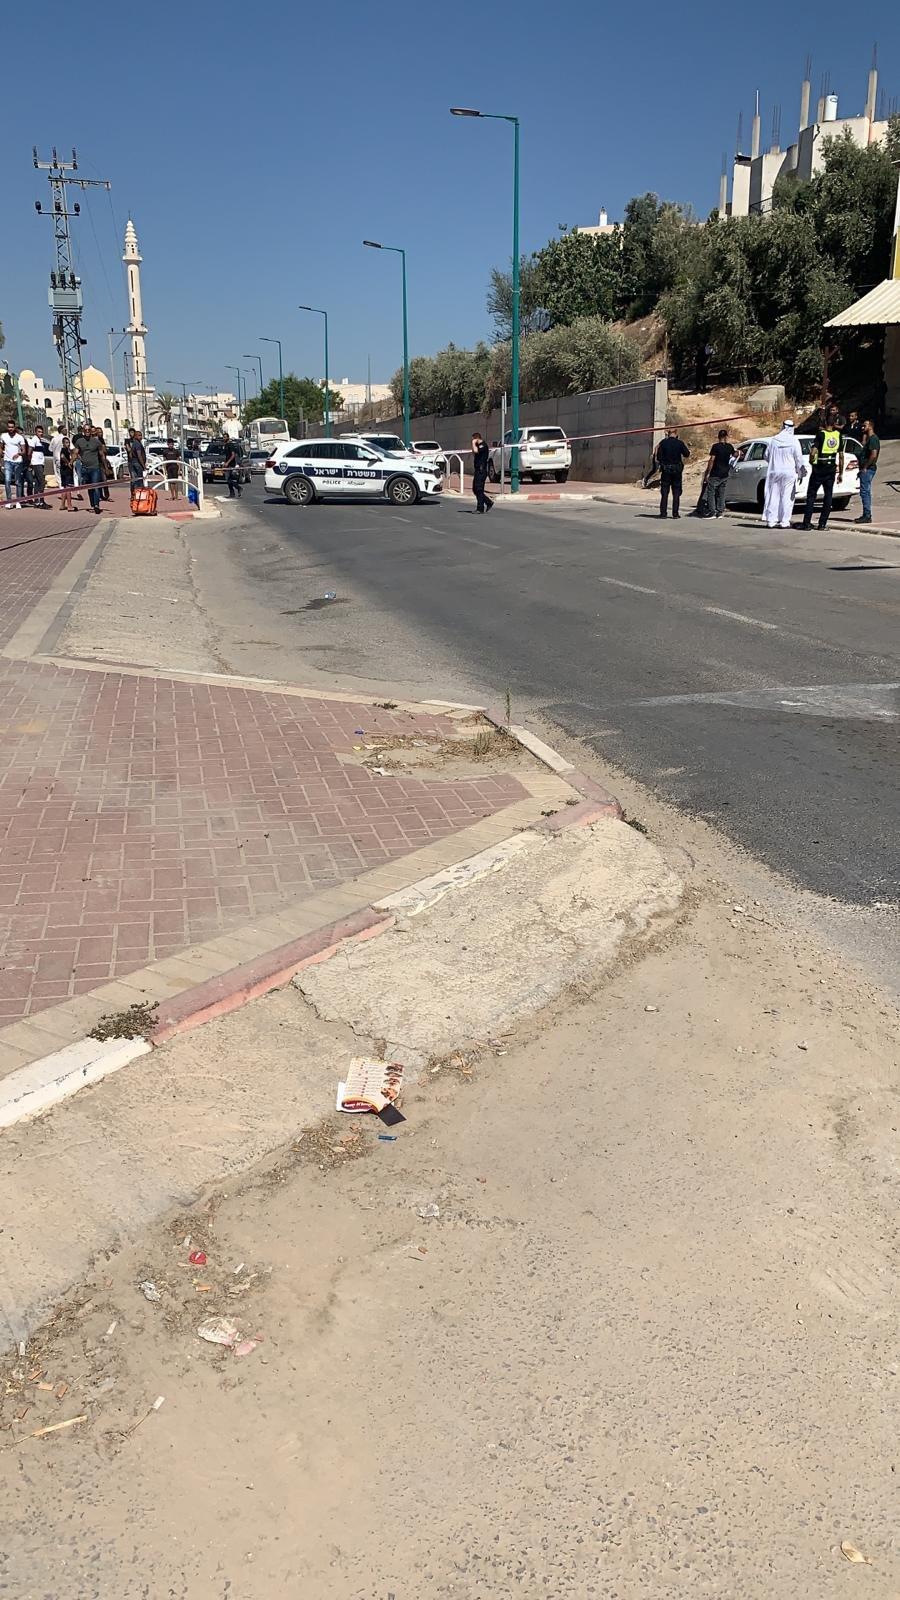 رهط: اصابة شاب بعد تعرضه لاطلاق نار